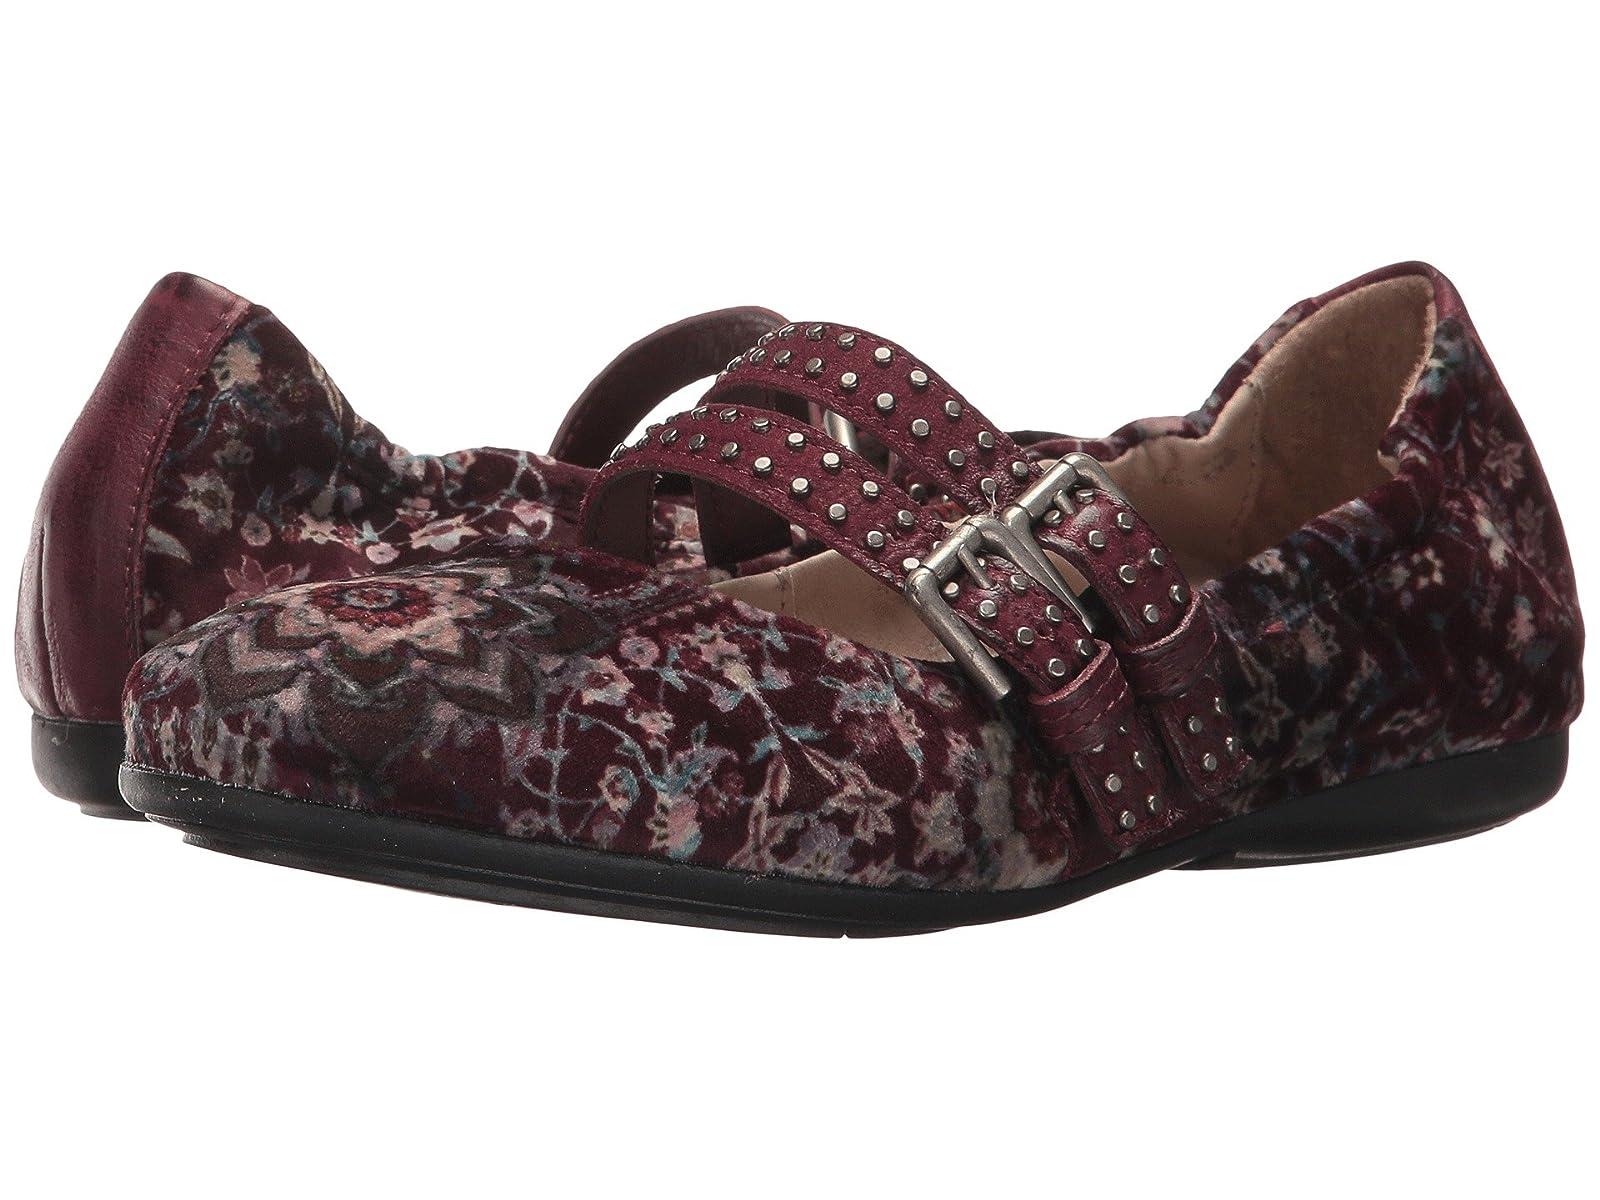 Miz Mooz CassiaCheap and distinctive eye-catching shoes